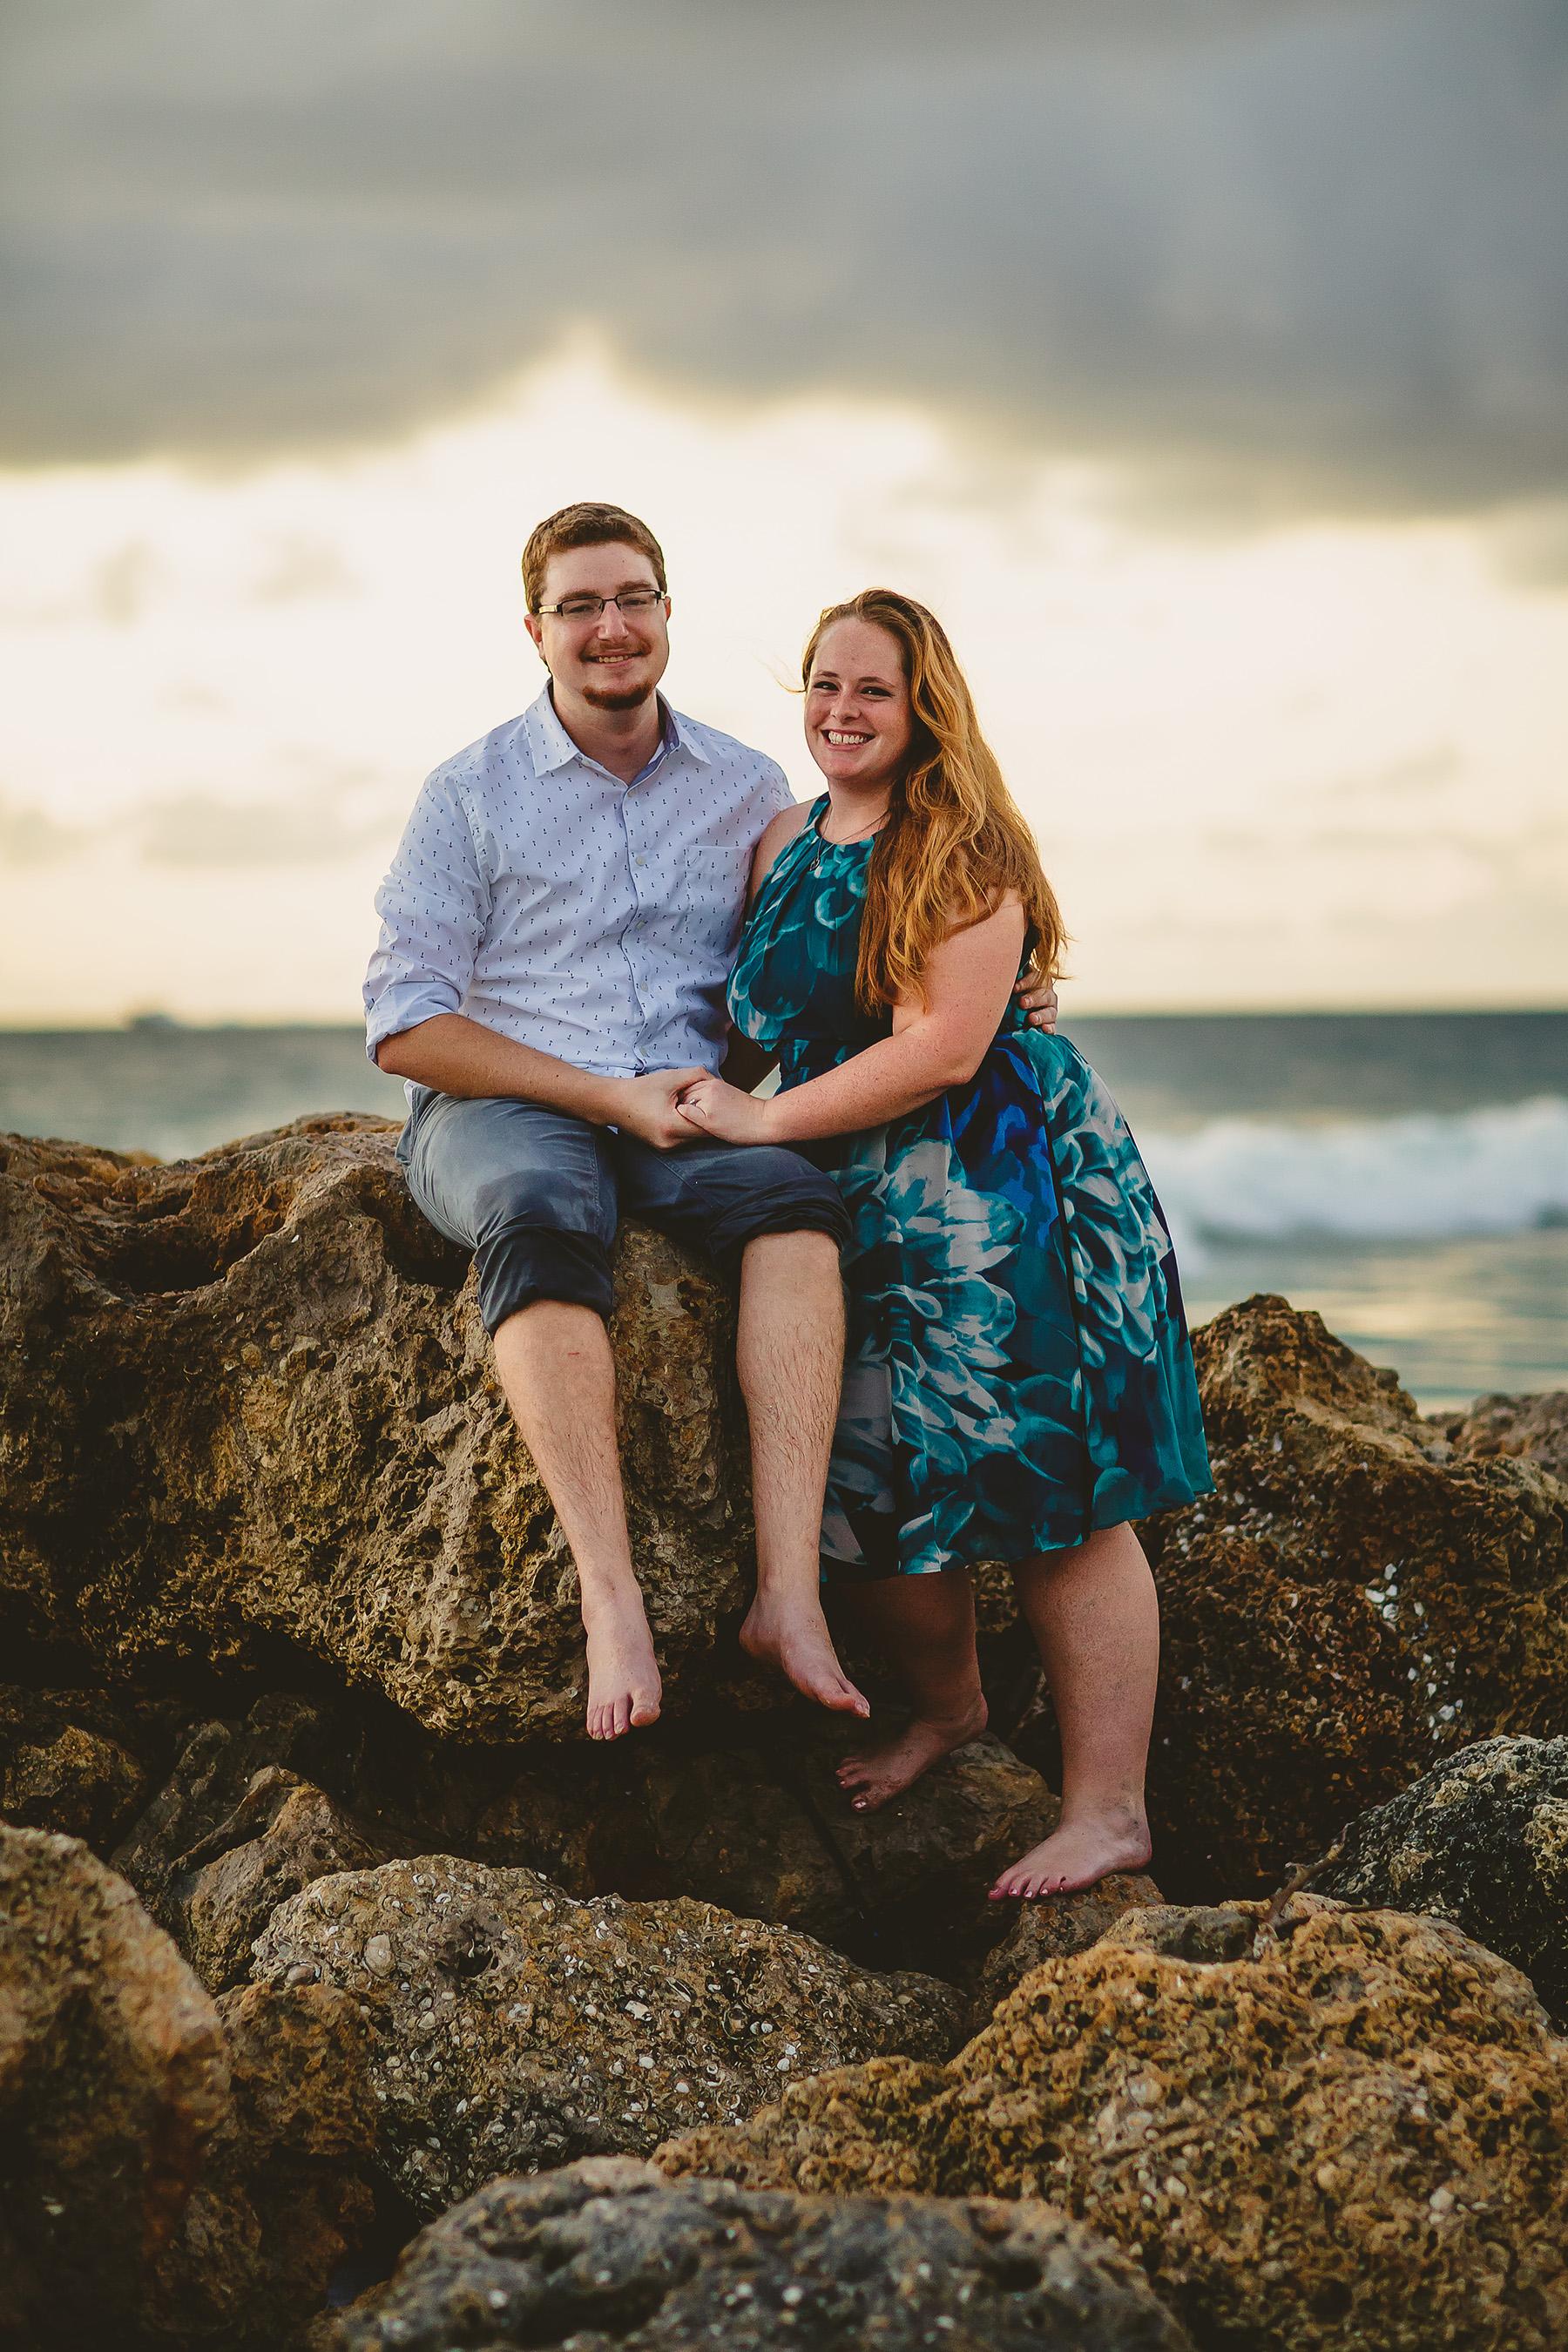 engaged-couple-beach-portraits-tiny-house-photo.jpg